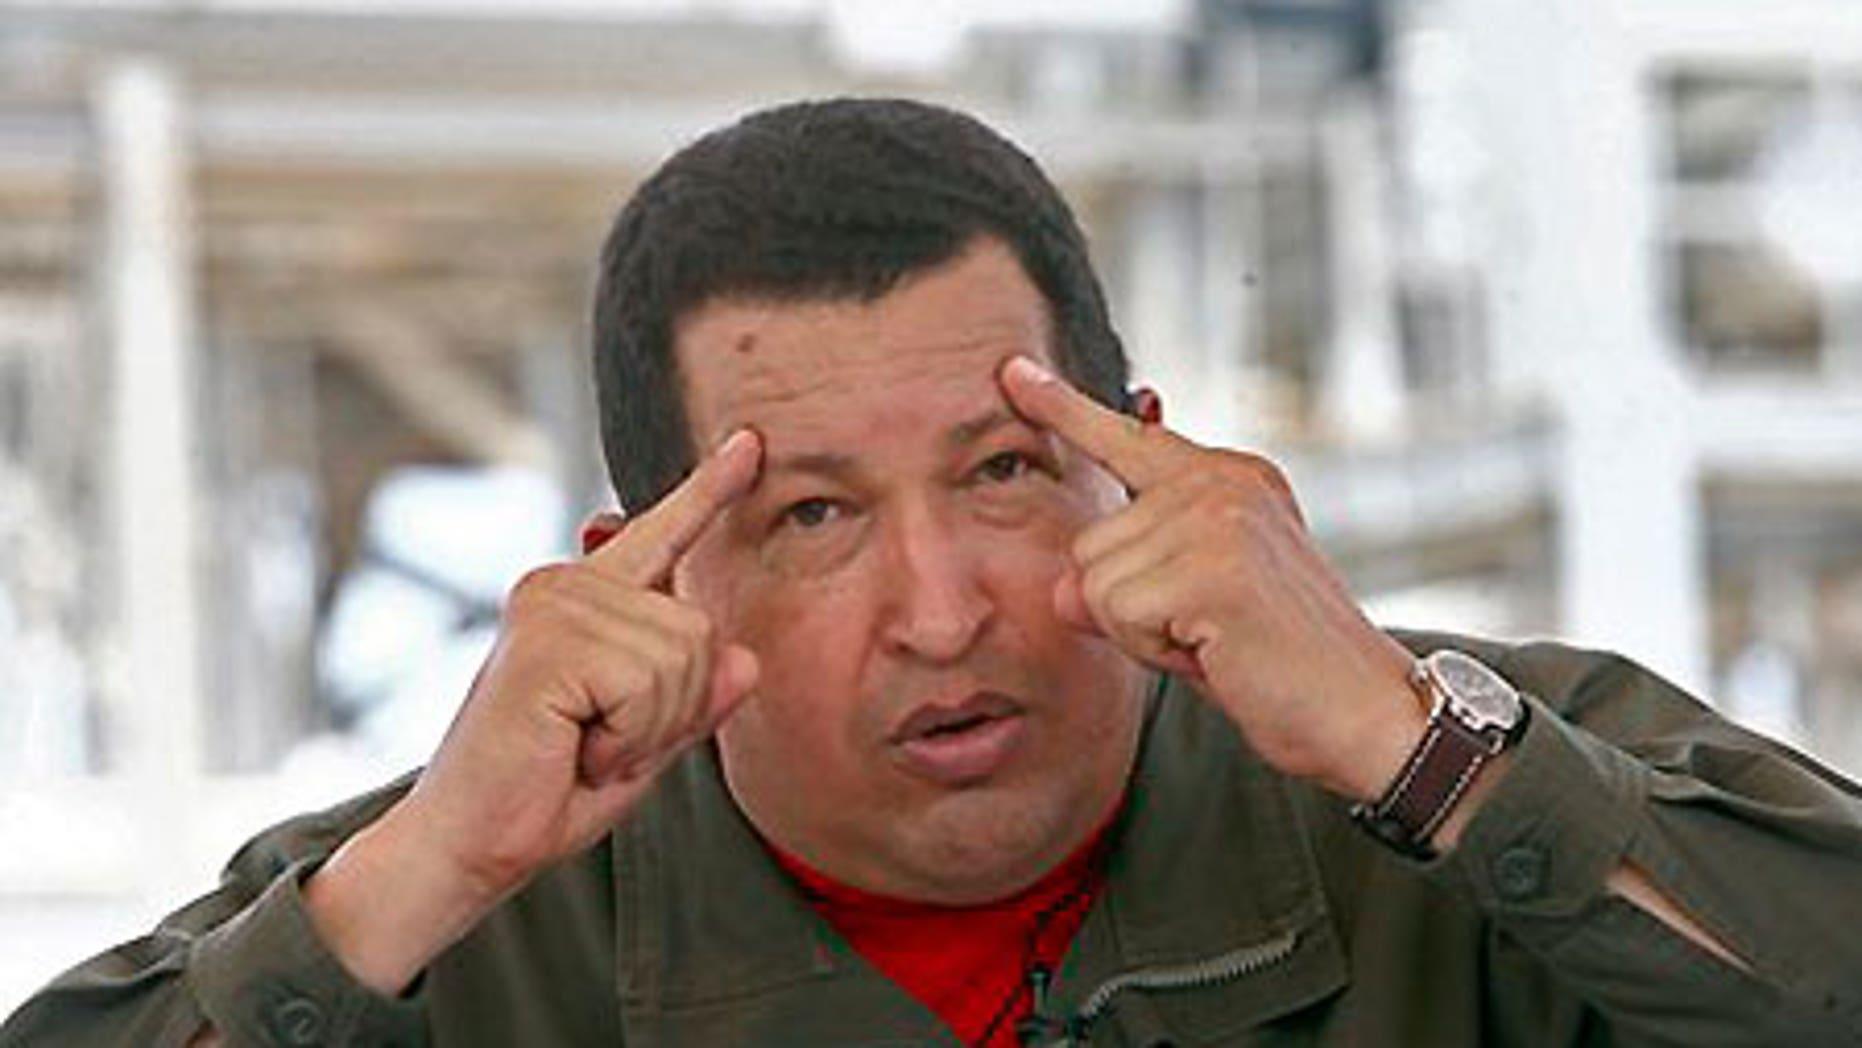 May 28: Venezuelan President Hugo Chavez gestures during his radio and television show 'Hello President' in Maracaibo, Venezuela.